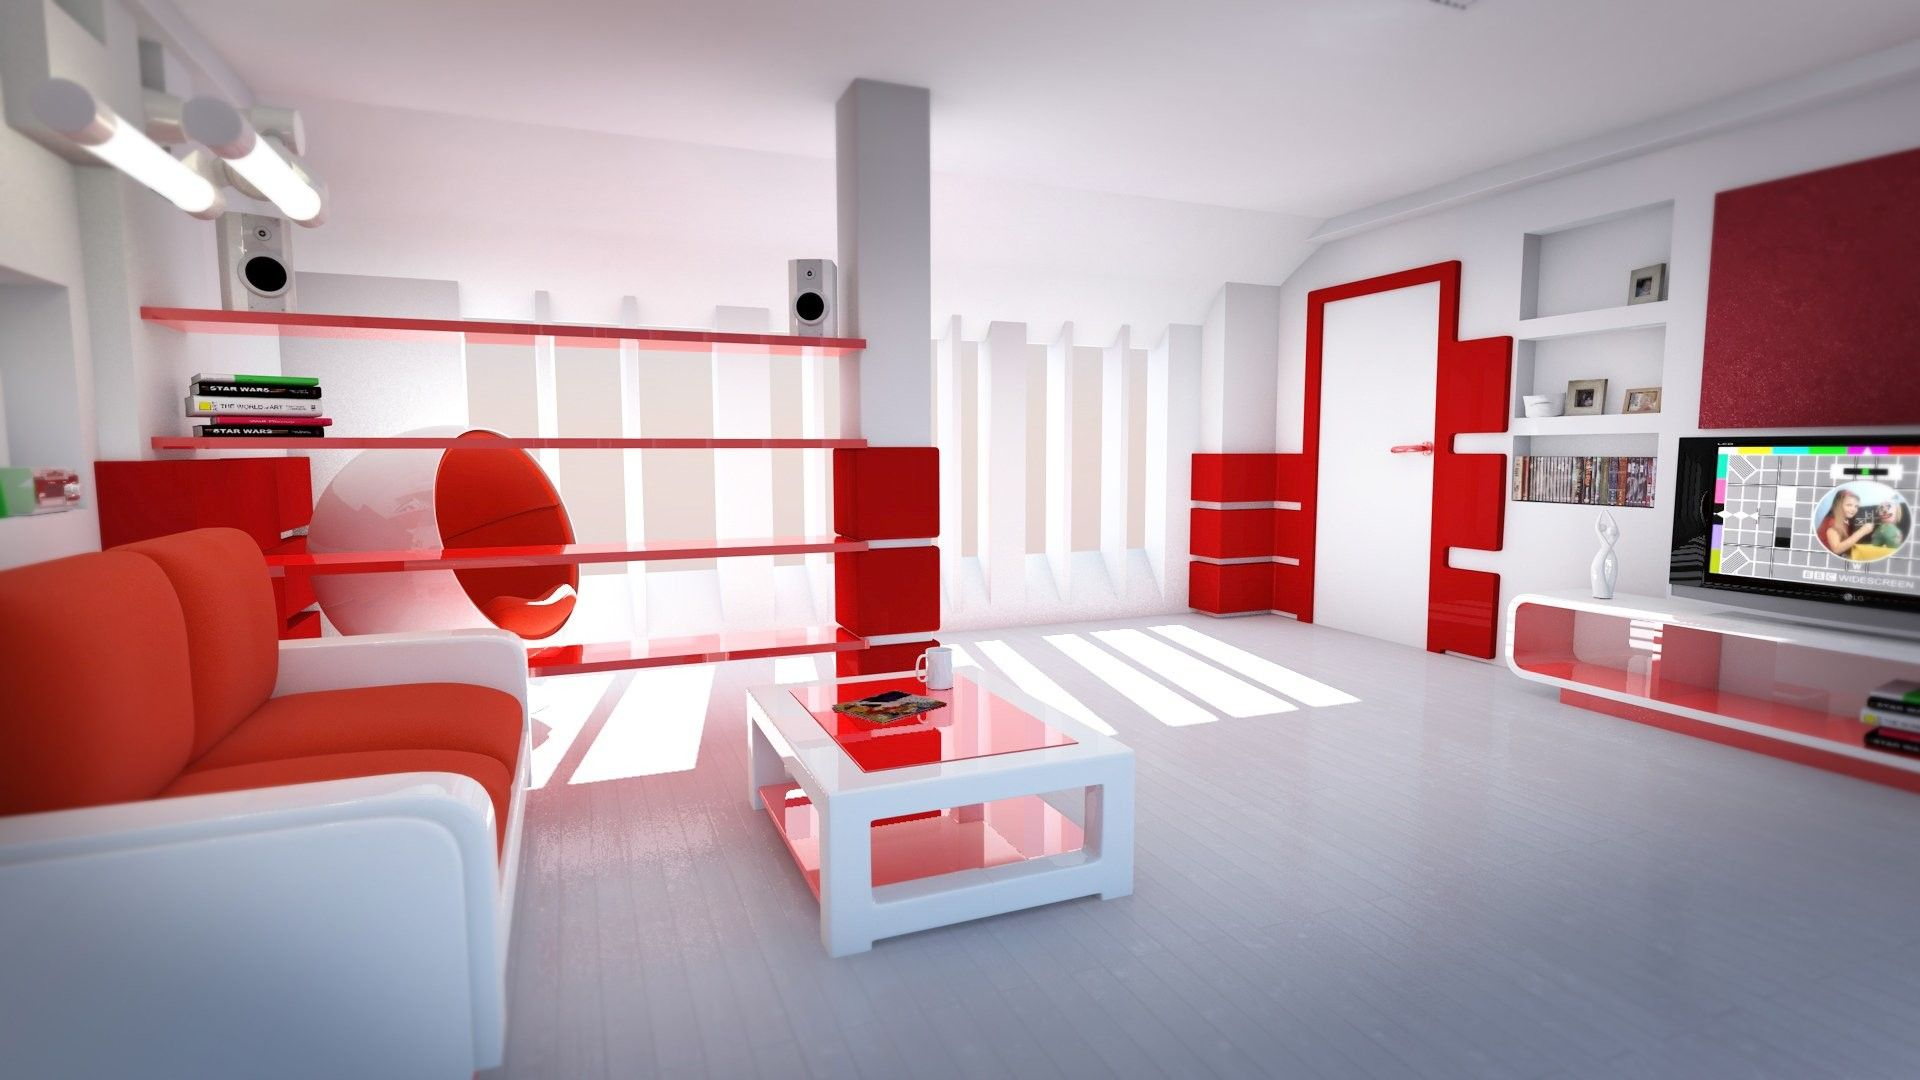 1920x1080 Living Room Shelves Free Desktop Backgroun